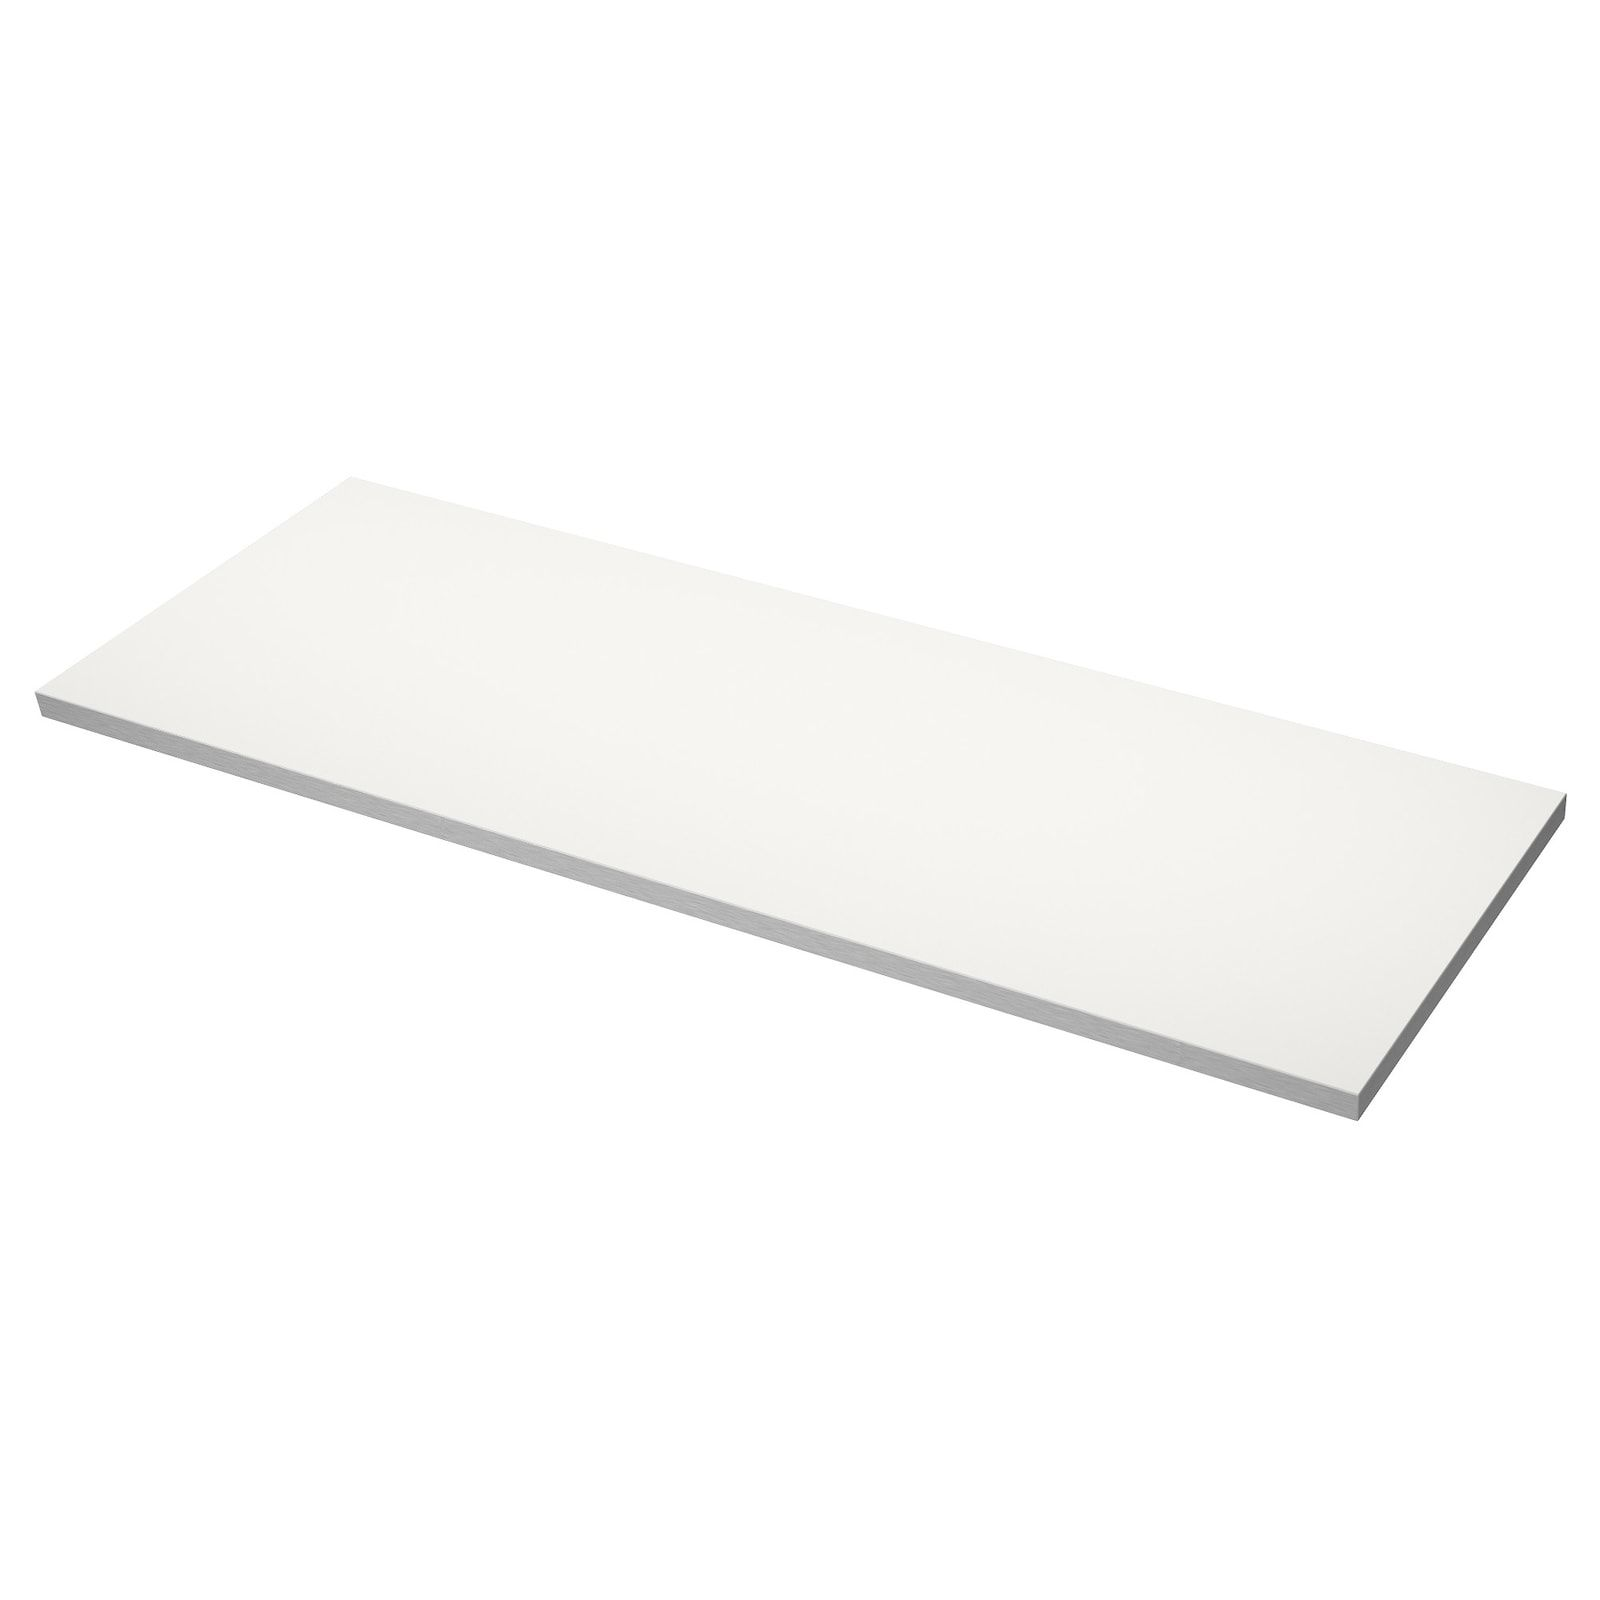 Hallestad Countertop Double Sided White Aluminum Effect Aluminum Effect Metal Effect Edge Laminate With Metal Effect Edge In 2020 Laminate Countertops Laminate Ikea